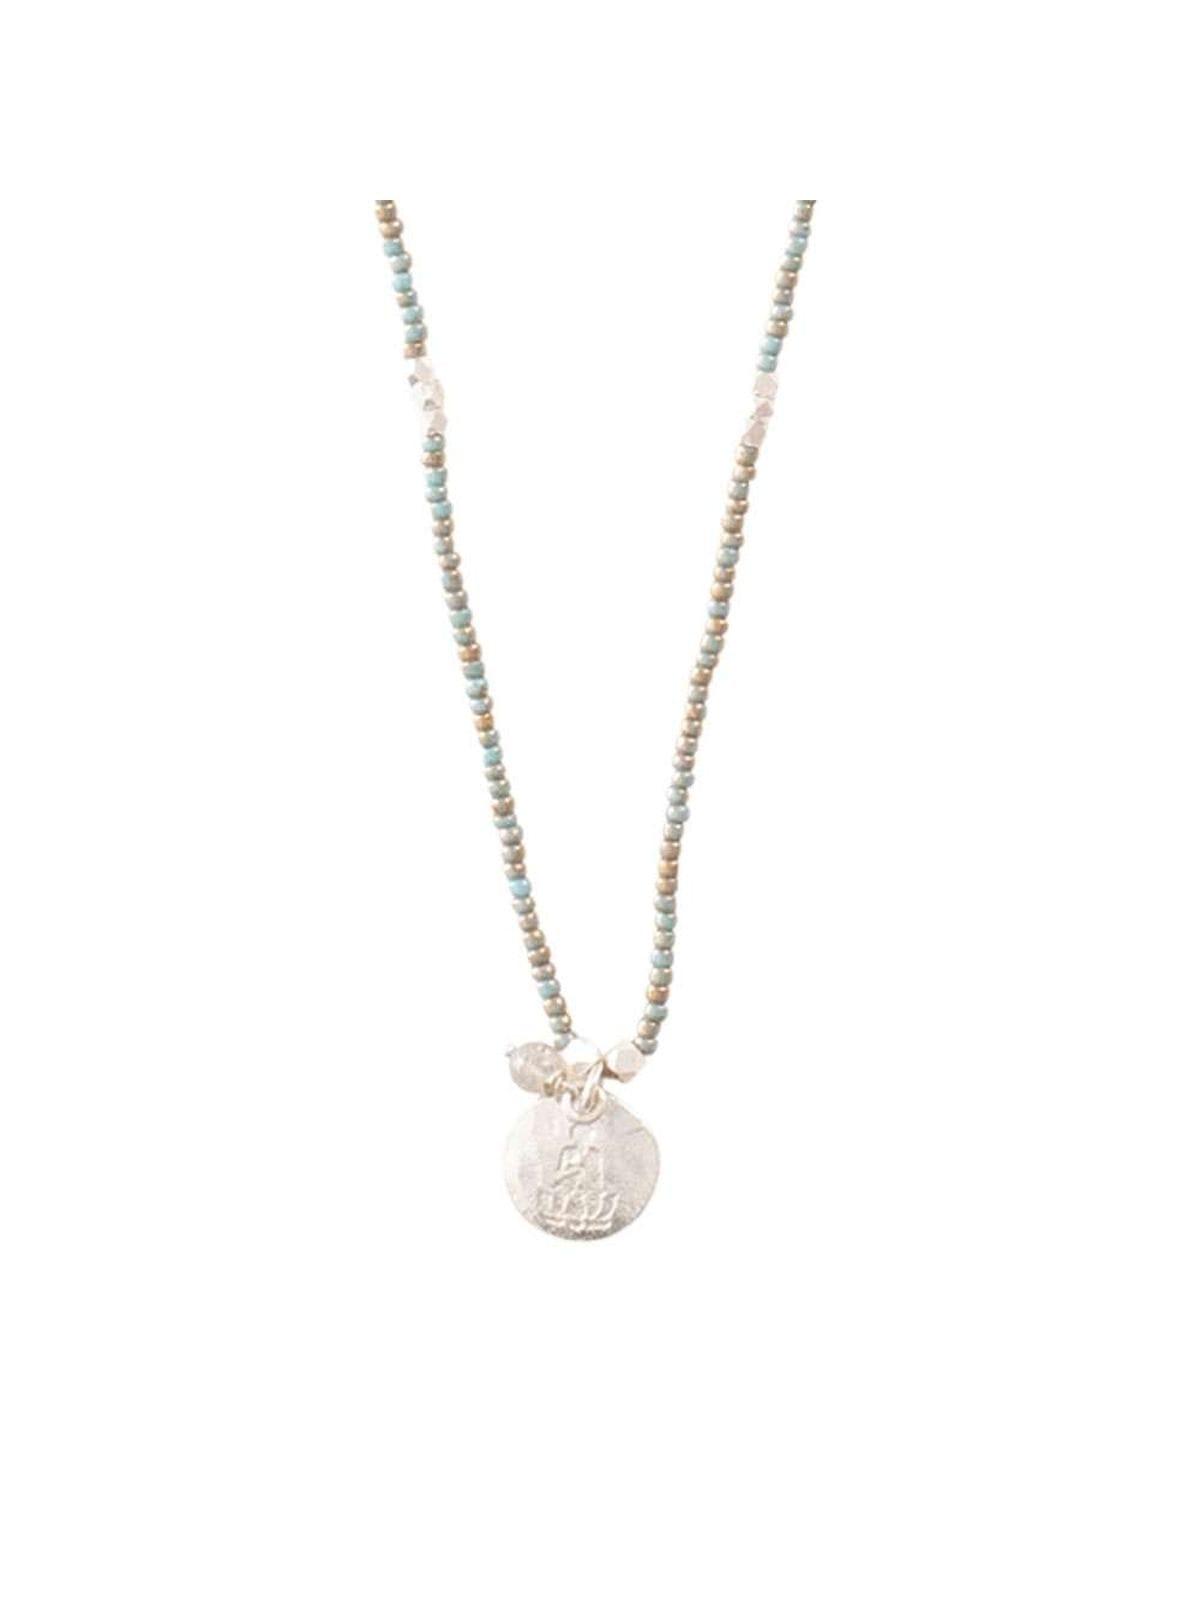 bl22659-fall-labradorite-buddha-coin-silver-necklaceLWQeqPEpz29u4_600x600@2x_1200x1600